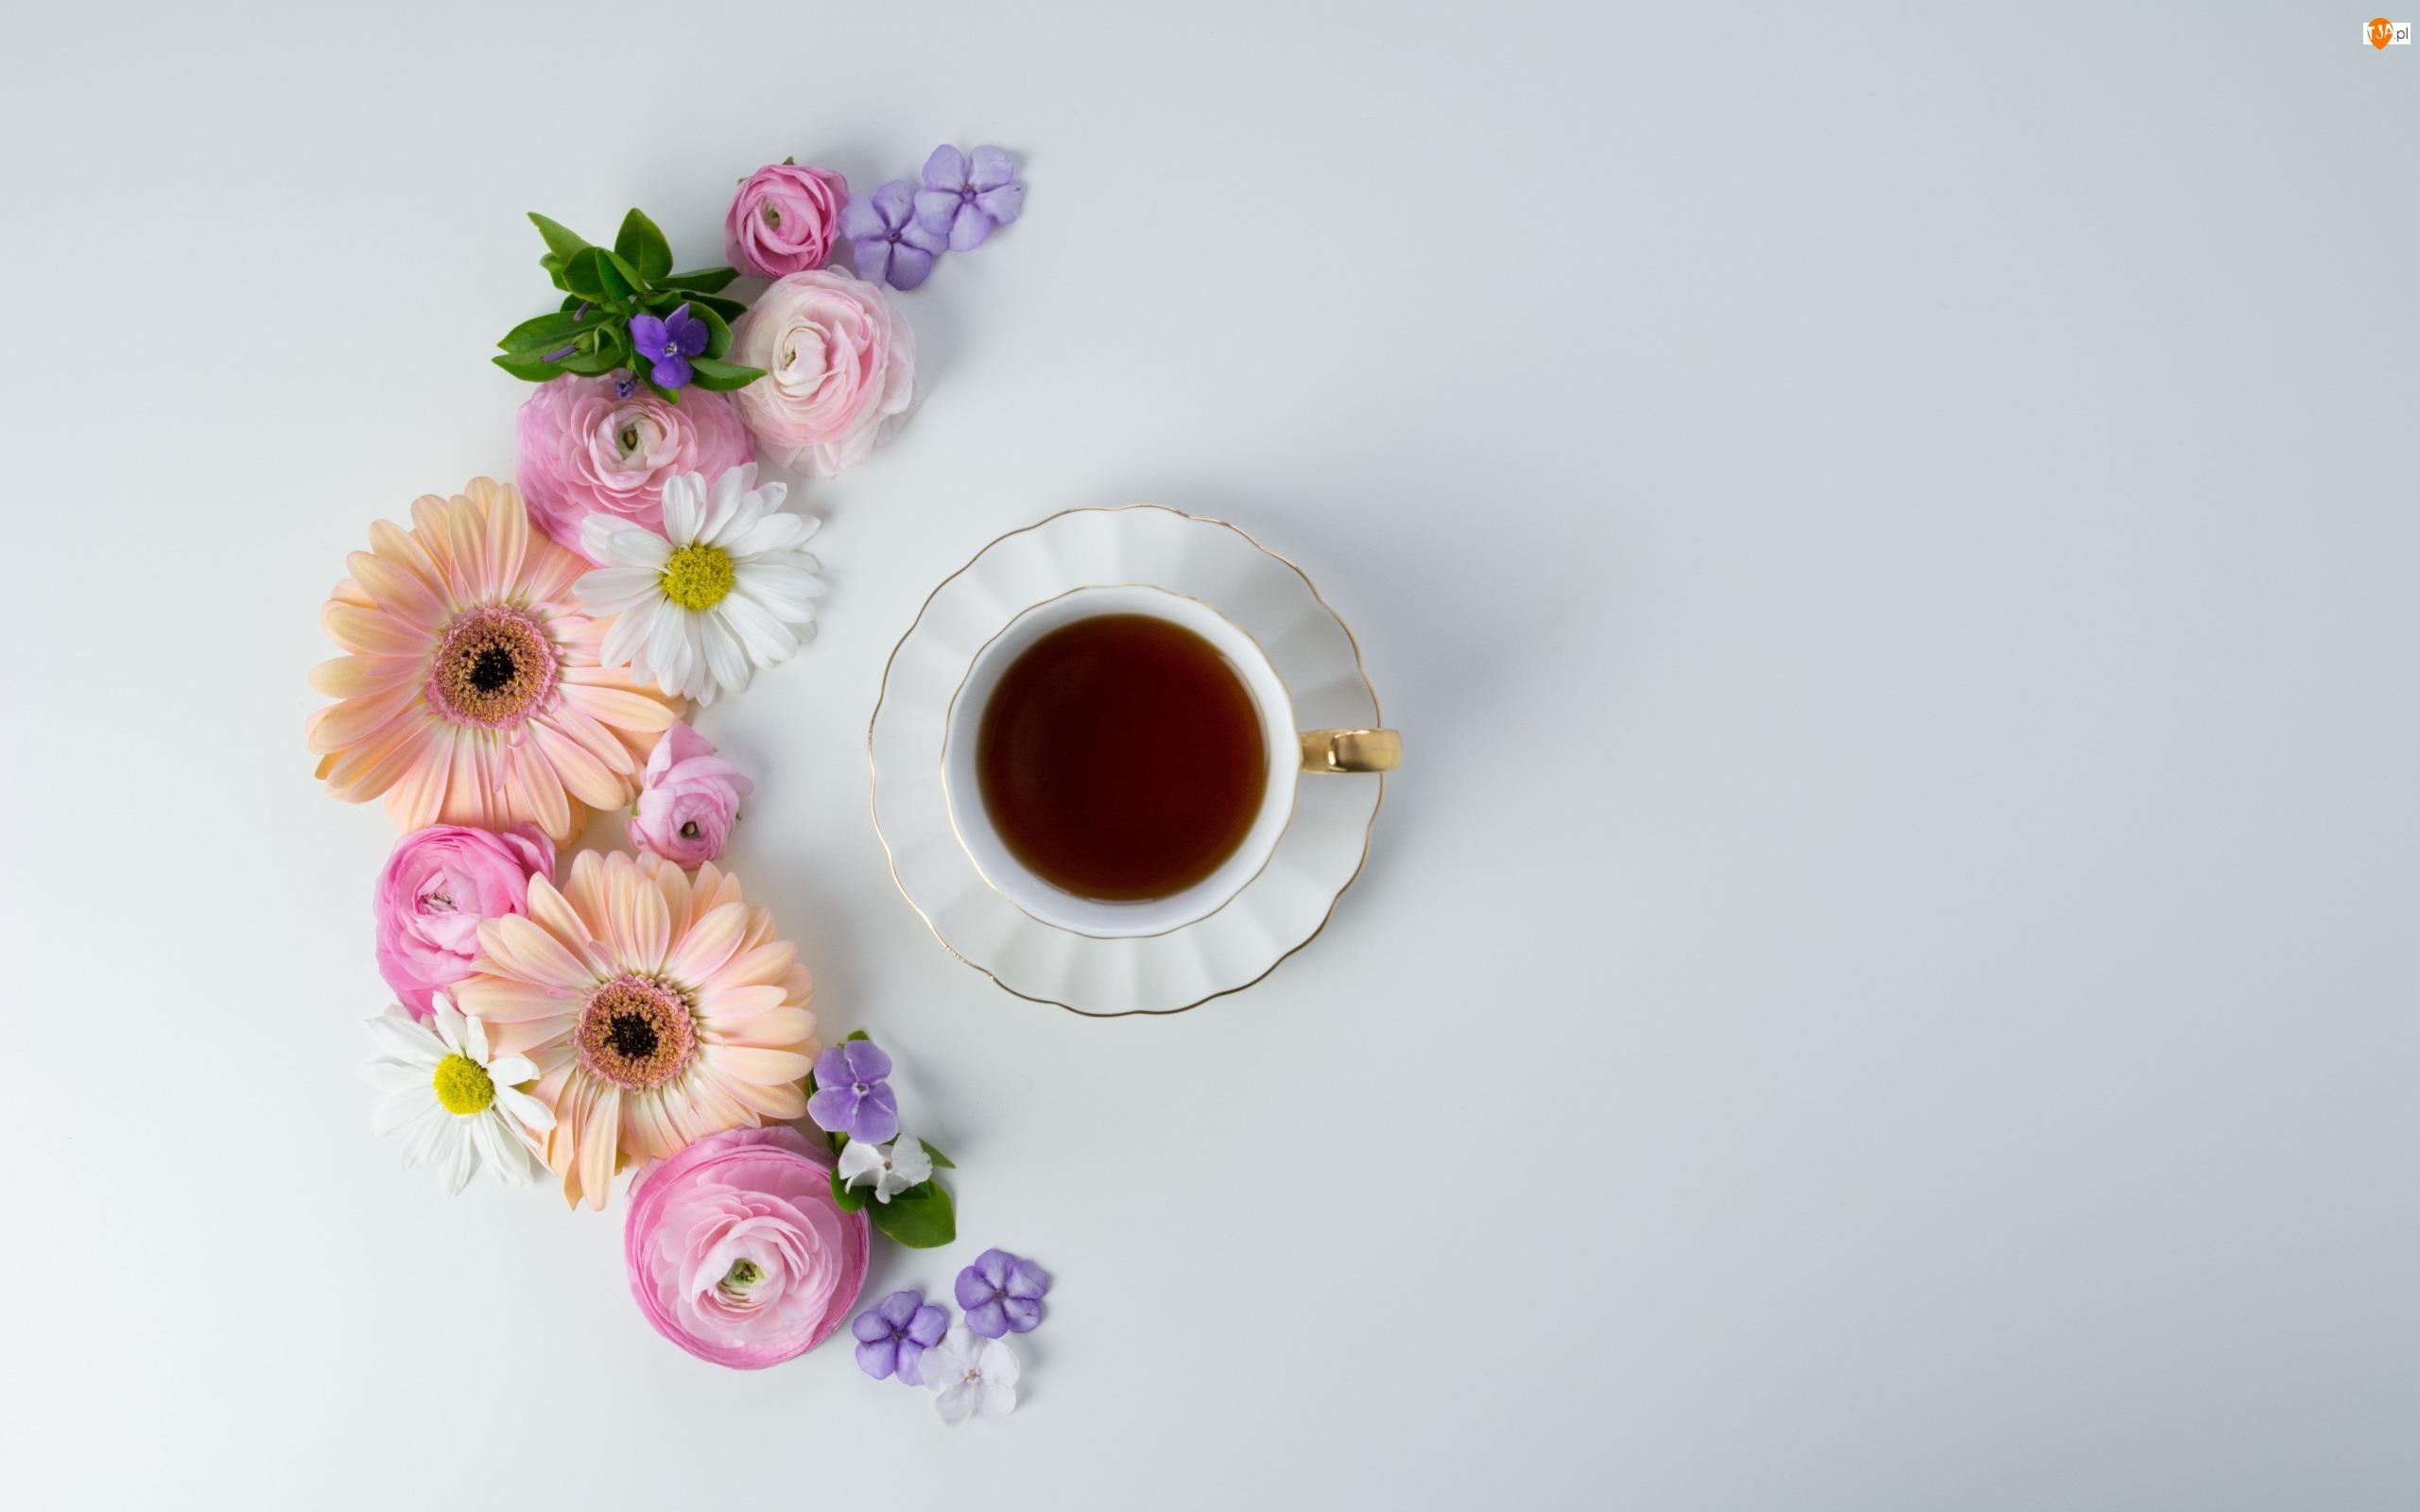 Kwiaty, Jaskry, Filiżanka, Herbata, Gerbery